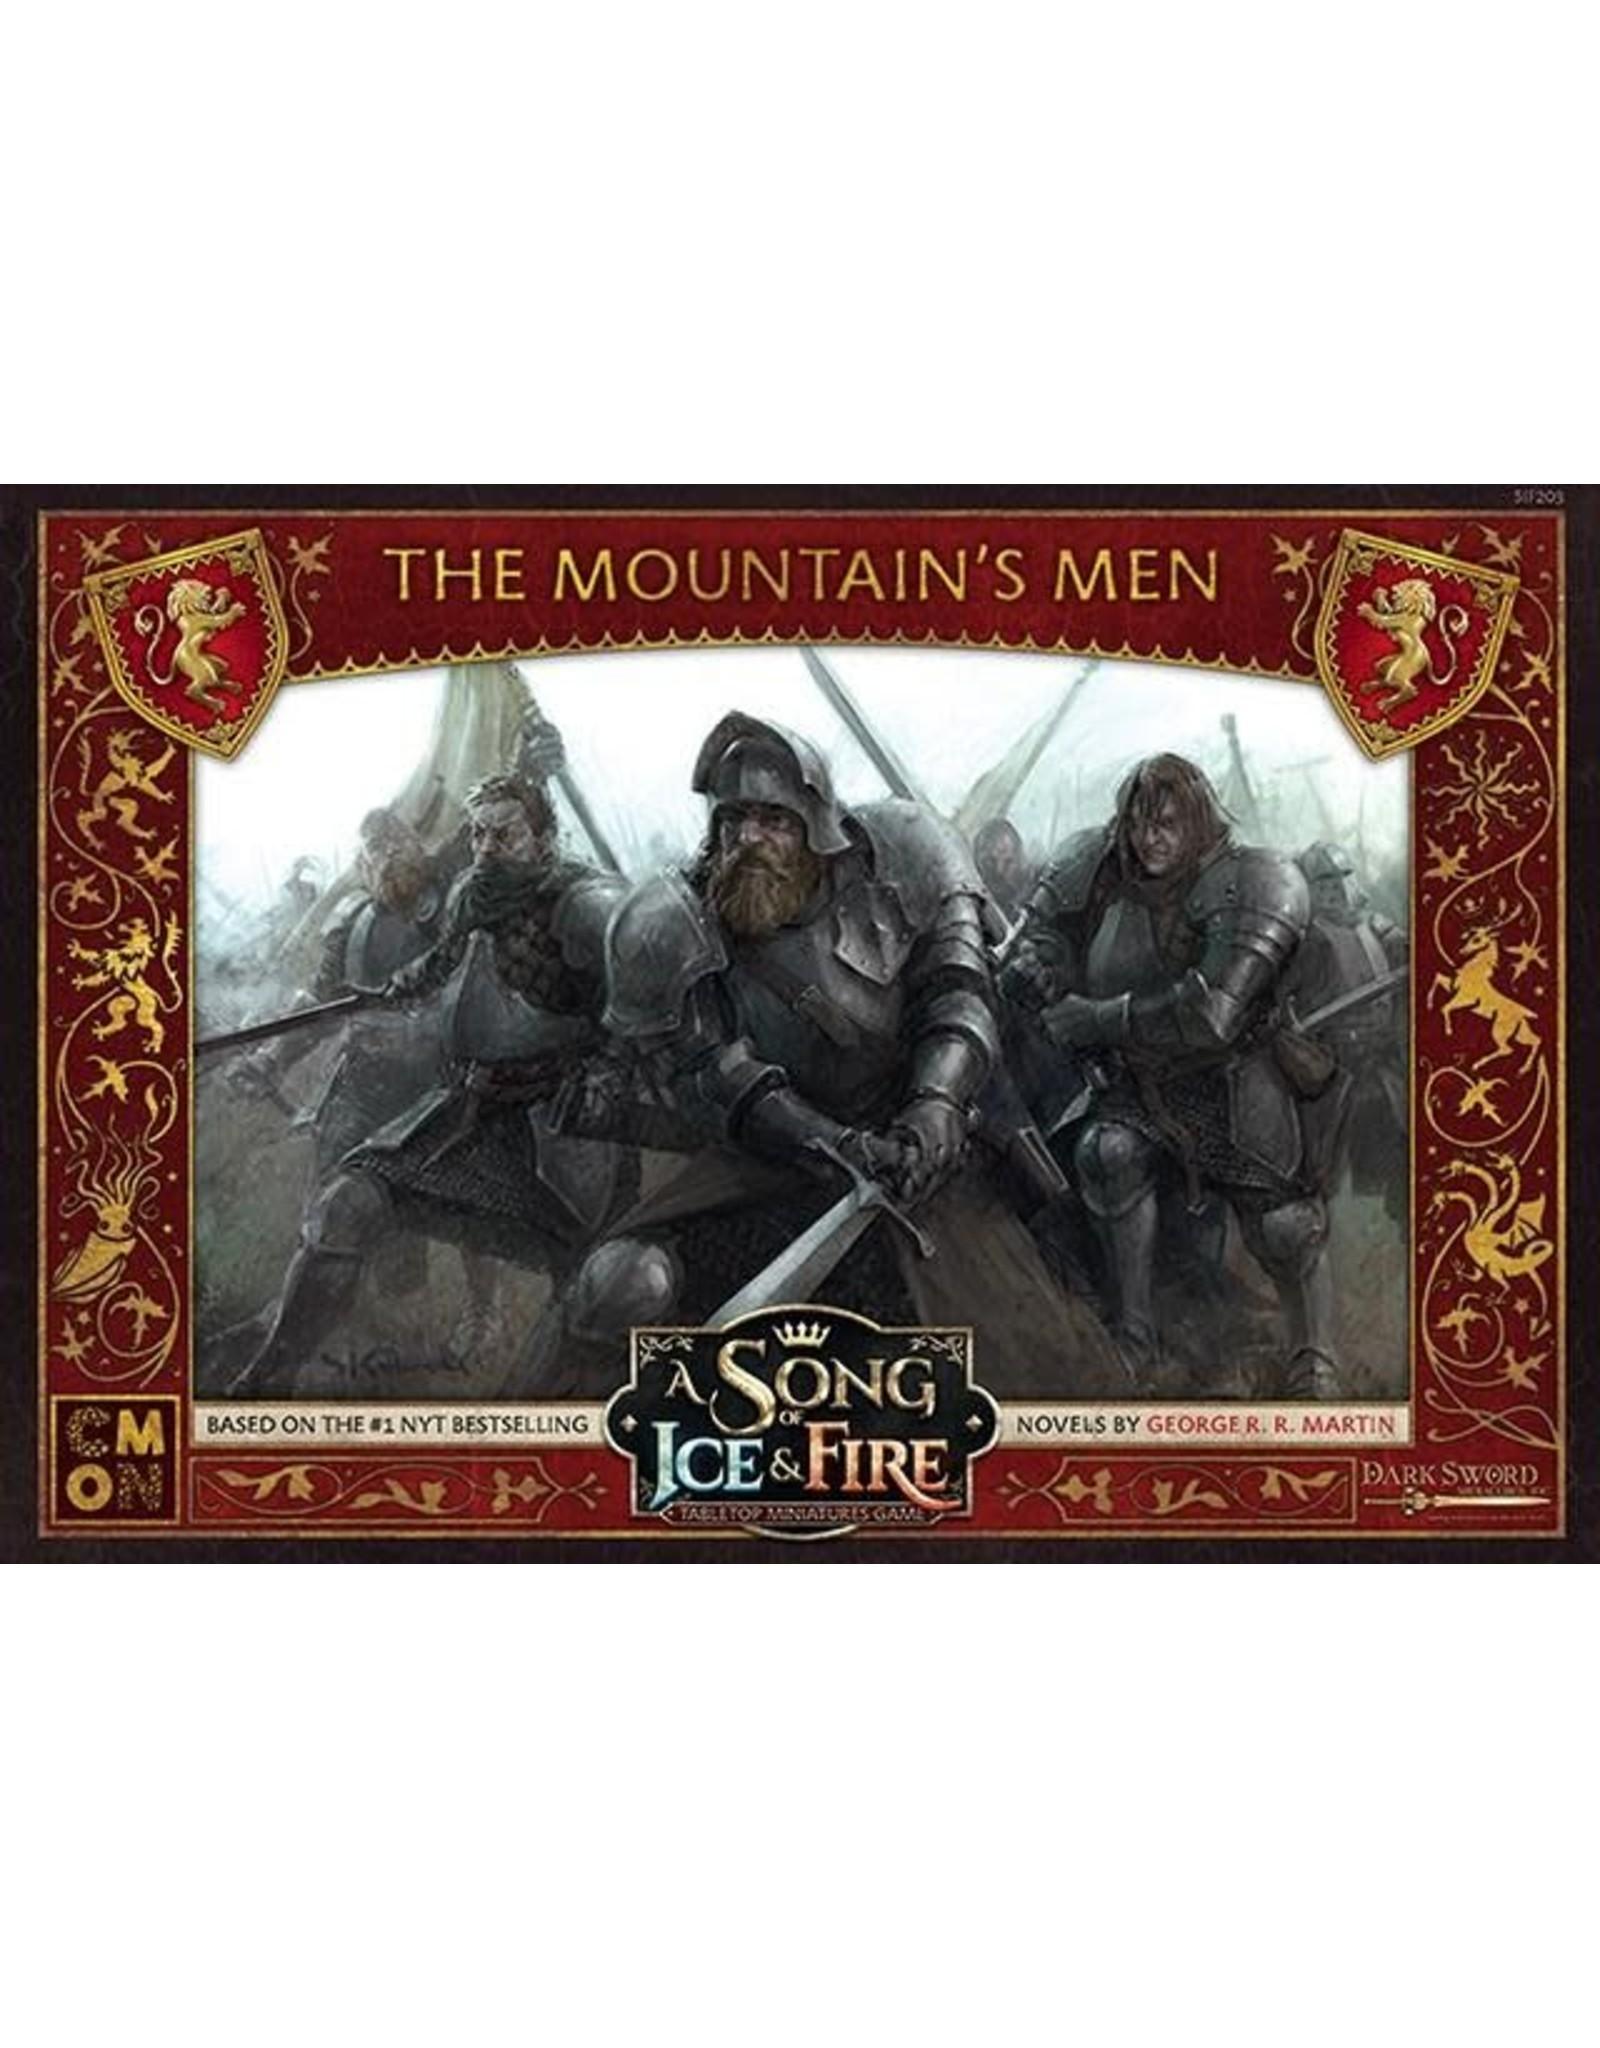 CMON A SONG OF ICE & FIRE: THE MOUNTAIN'S MEN